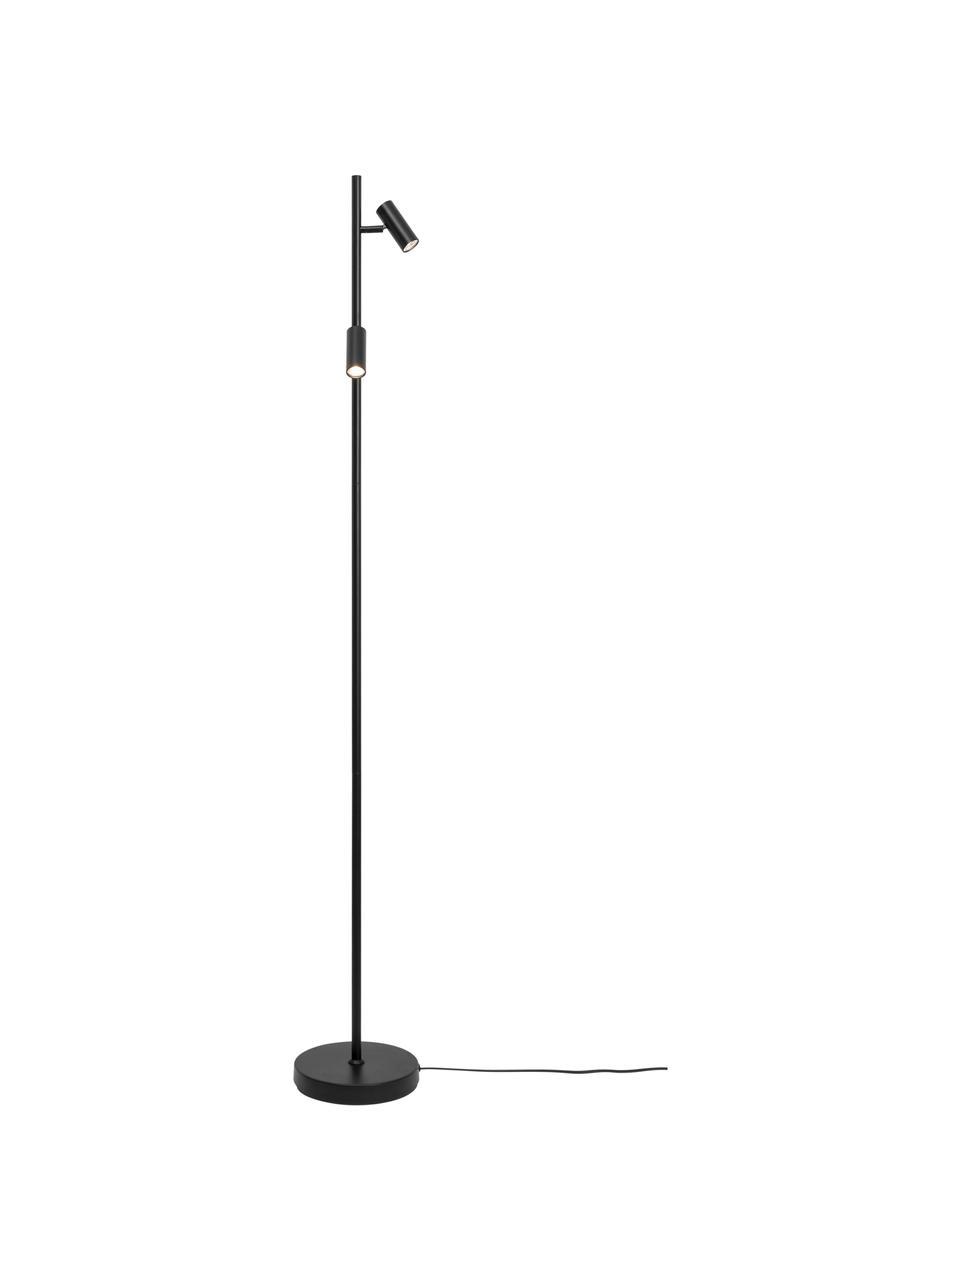 LED vloerlamp Omari, Lampenkap: gecoat metaal, Lampvoet: gecoat metaal, Zwart, 20 x 141 cm